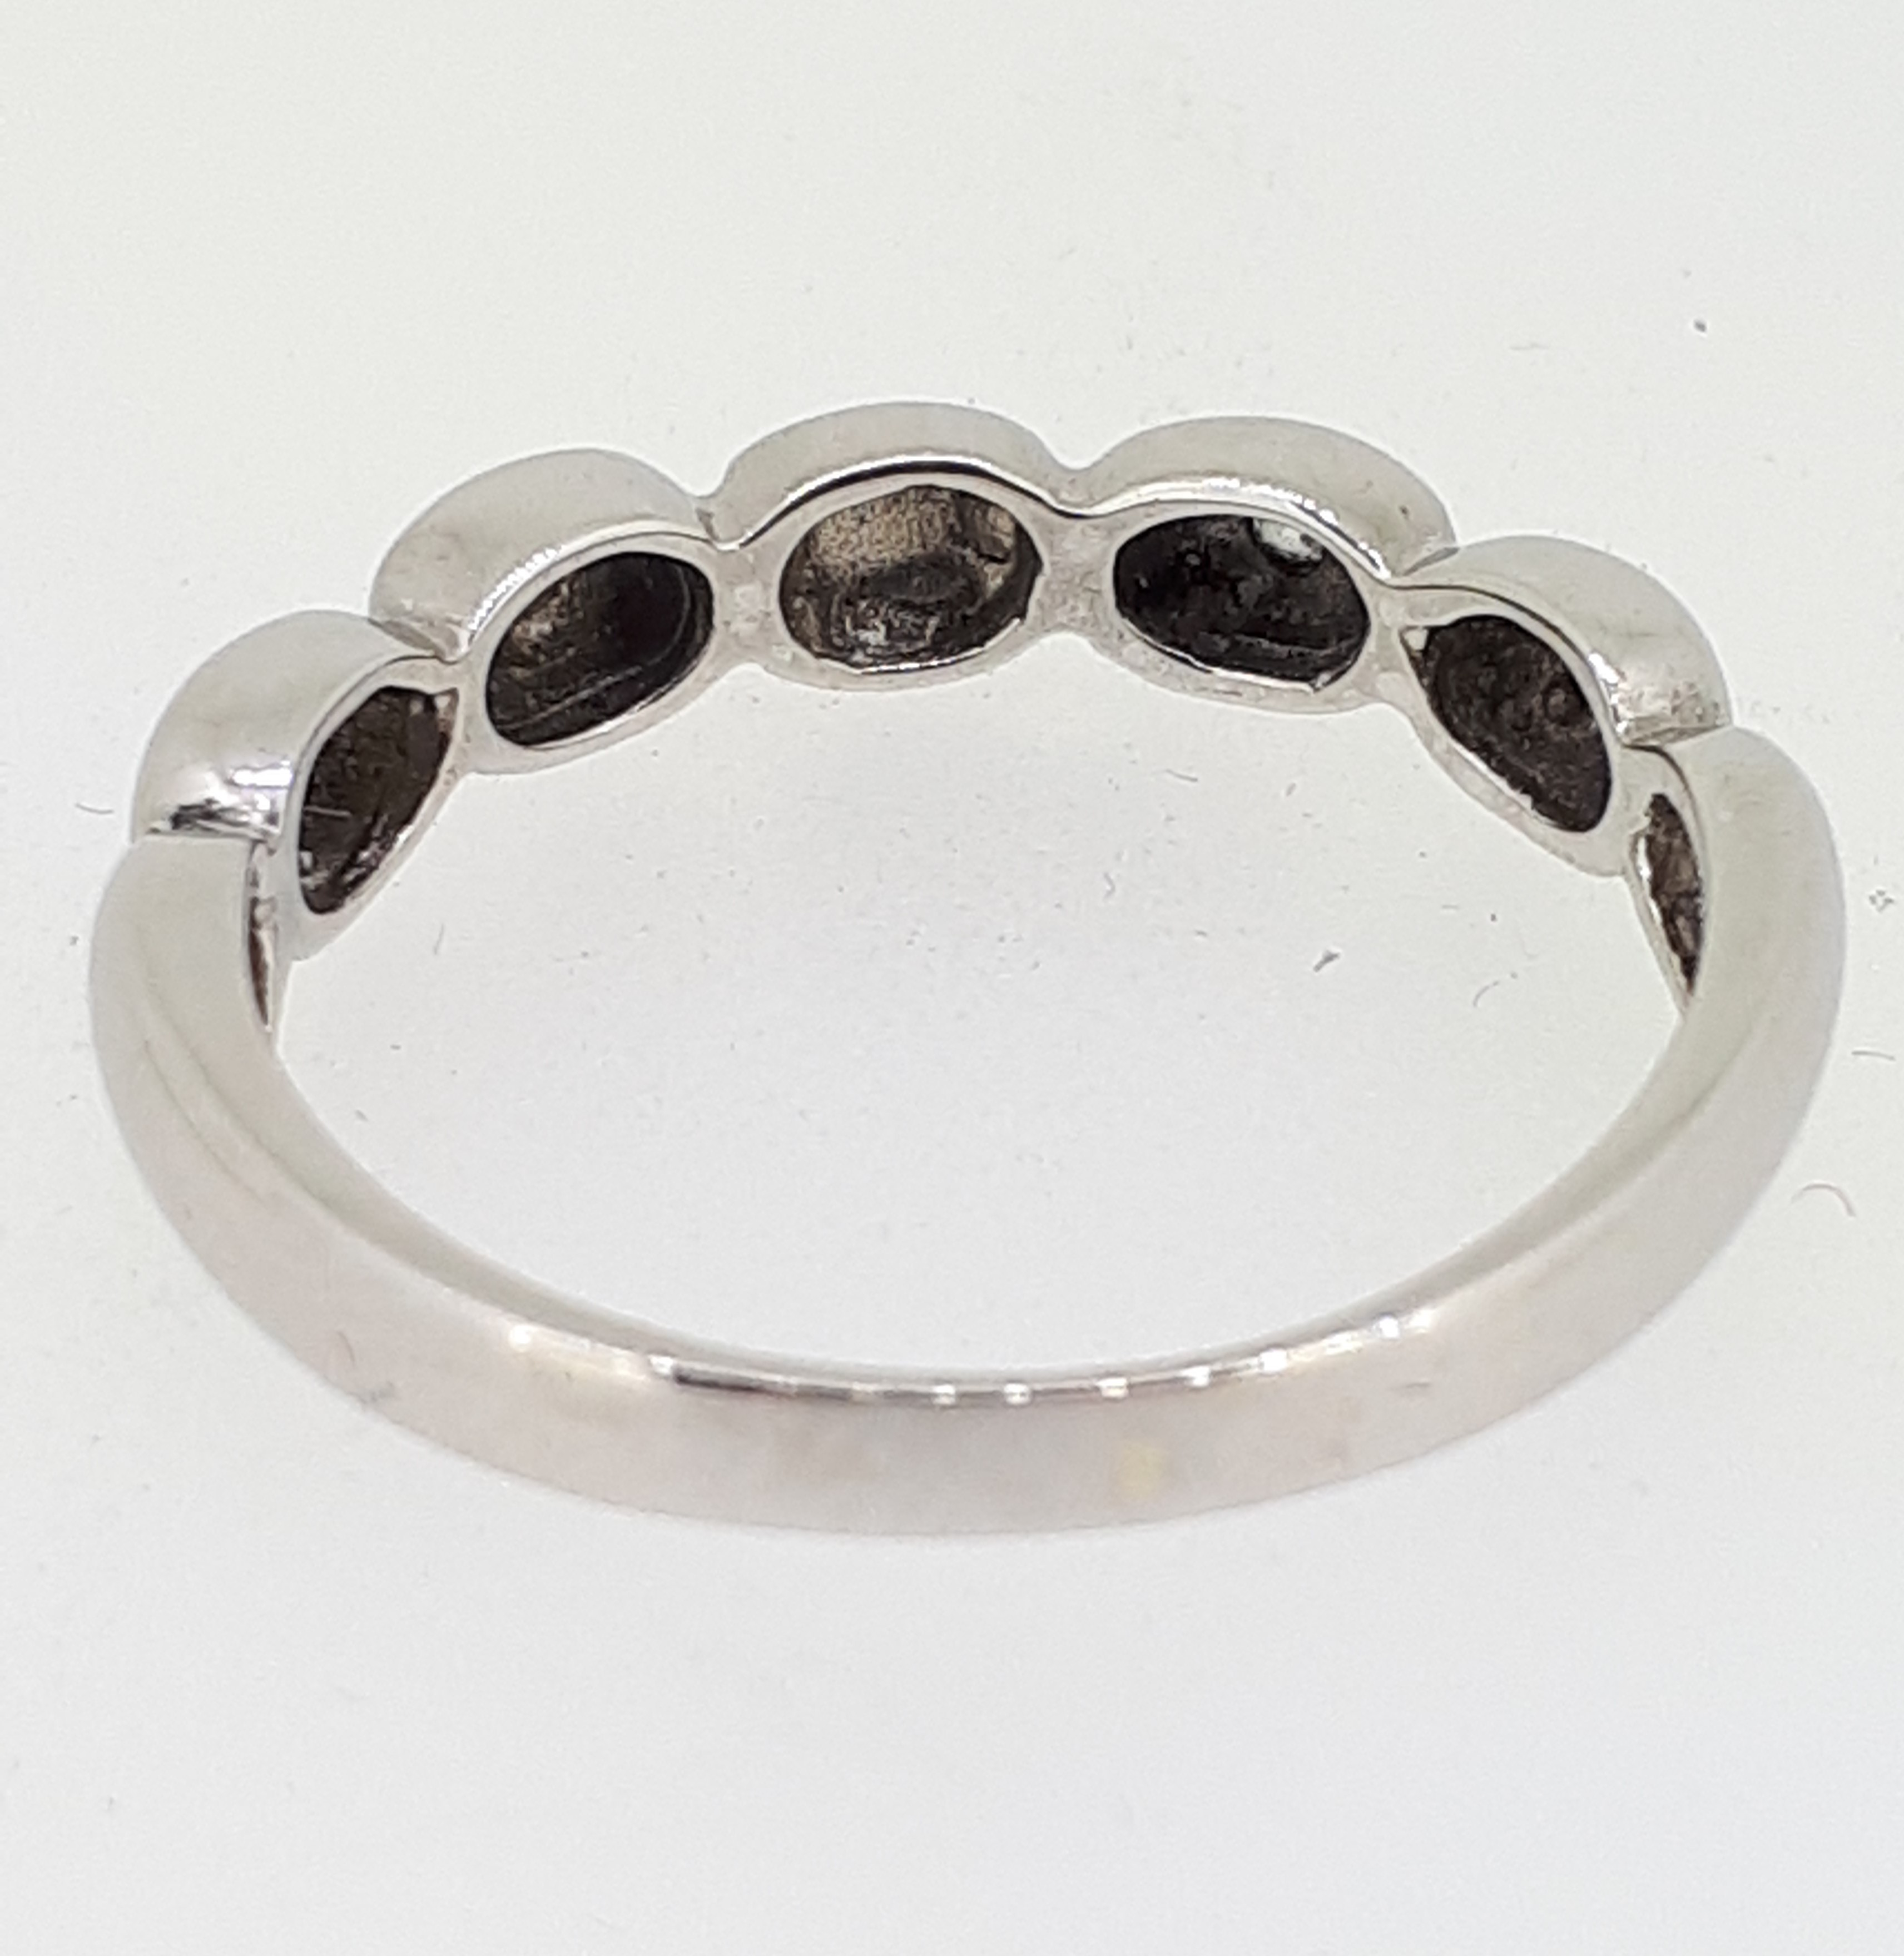 14ct (585) White Gold & Diamond Five Bead Ring - Image 6 of 6